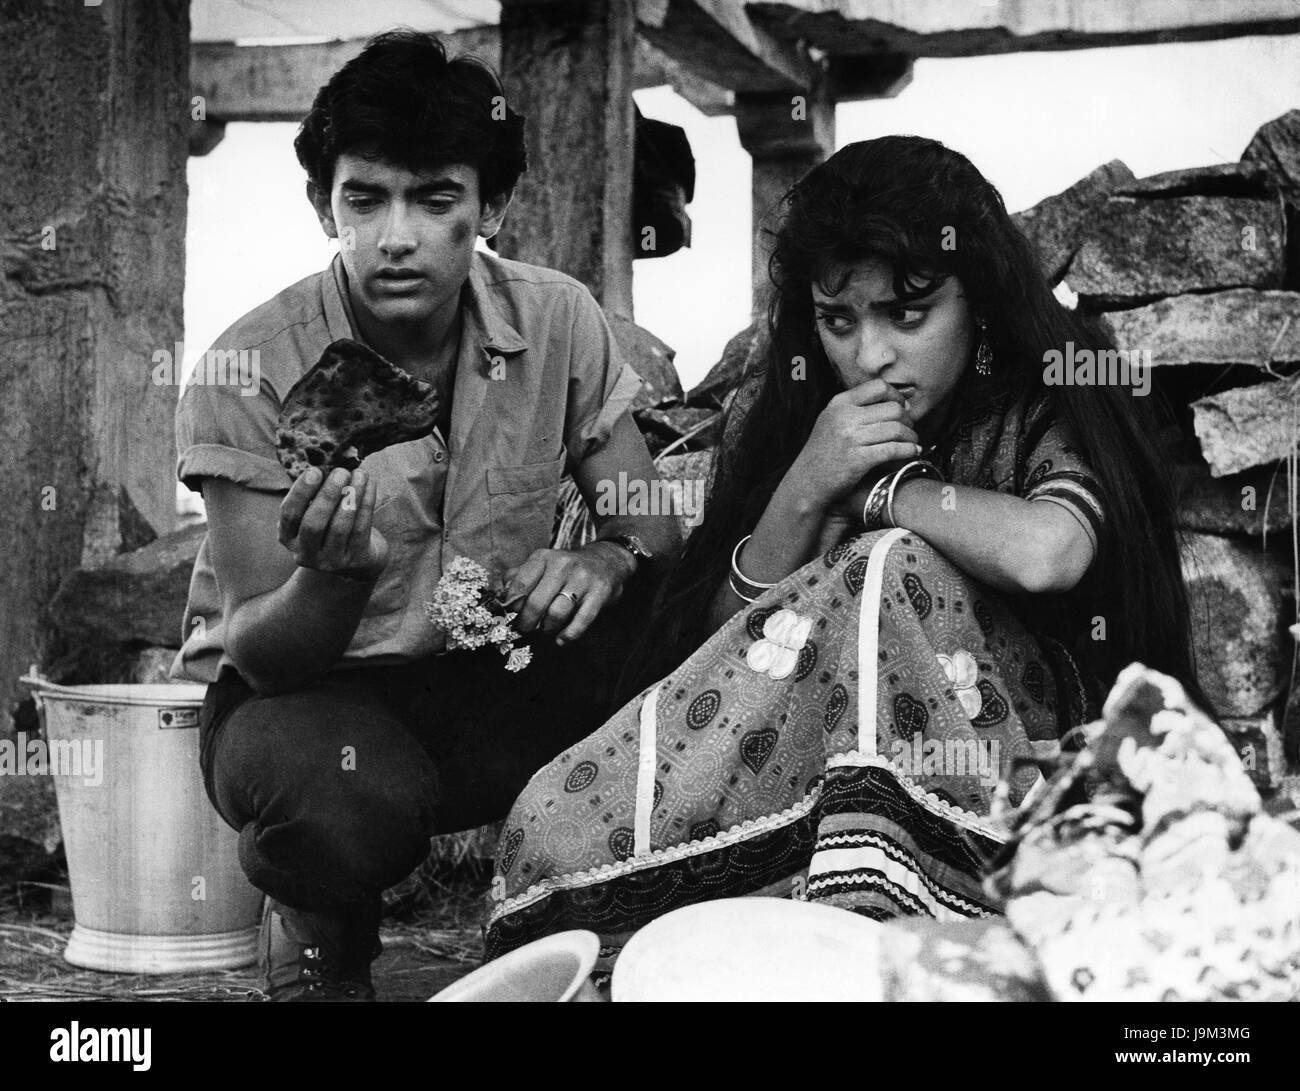 Indian hindi films actor and actress, juhi chawla and aamir khan, India, Asian, NOMR - Stock Image